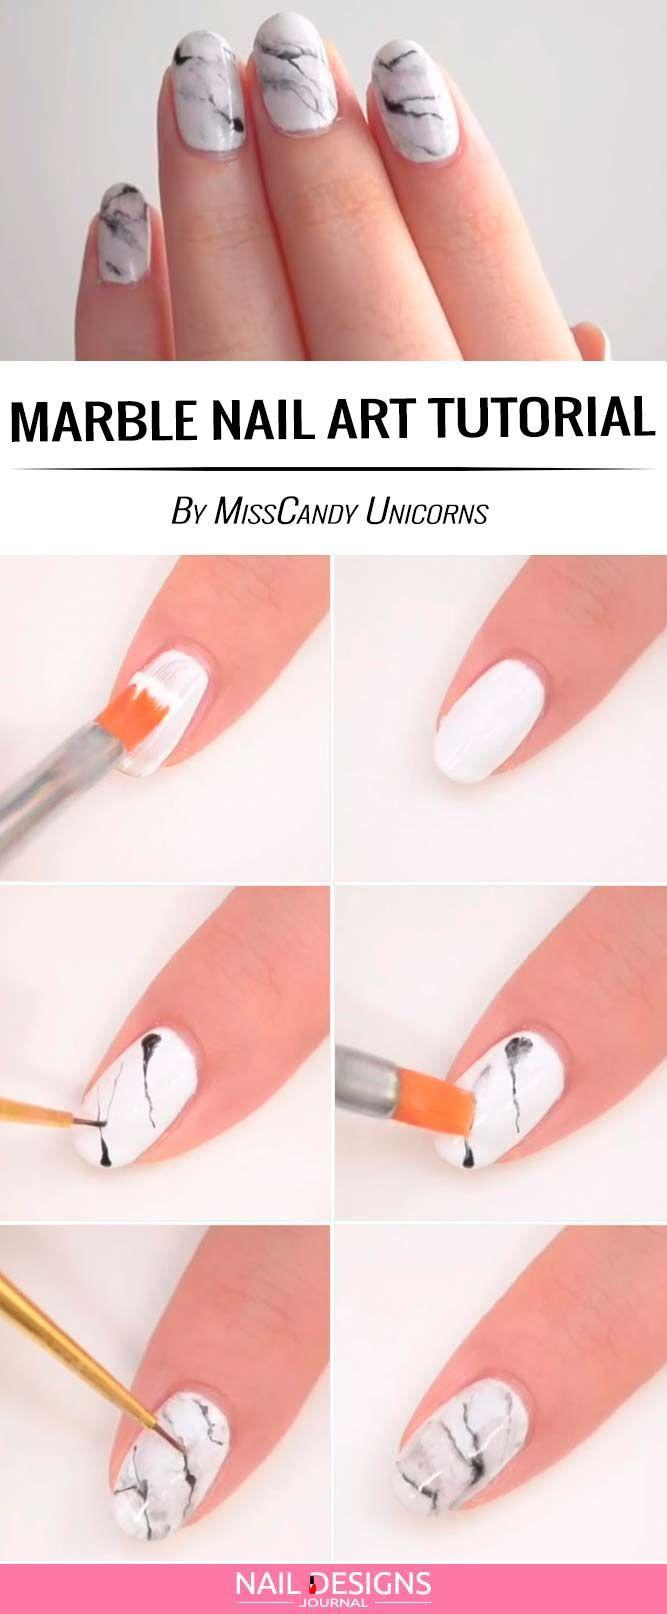 Cute And Easy Nail Designs to Do at Home ★ See more: https://naildesignsjournal.com/easy-nail-designs/ #nails #nails